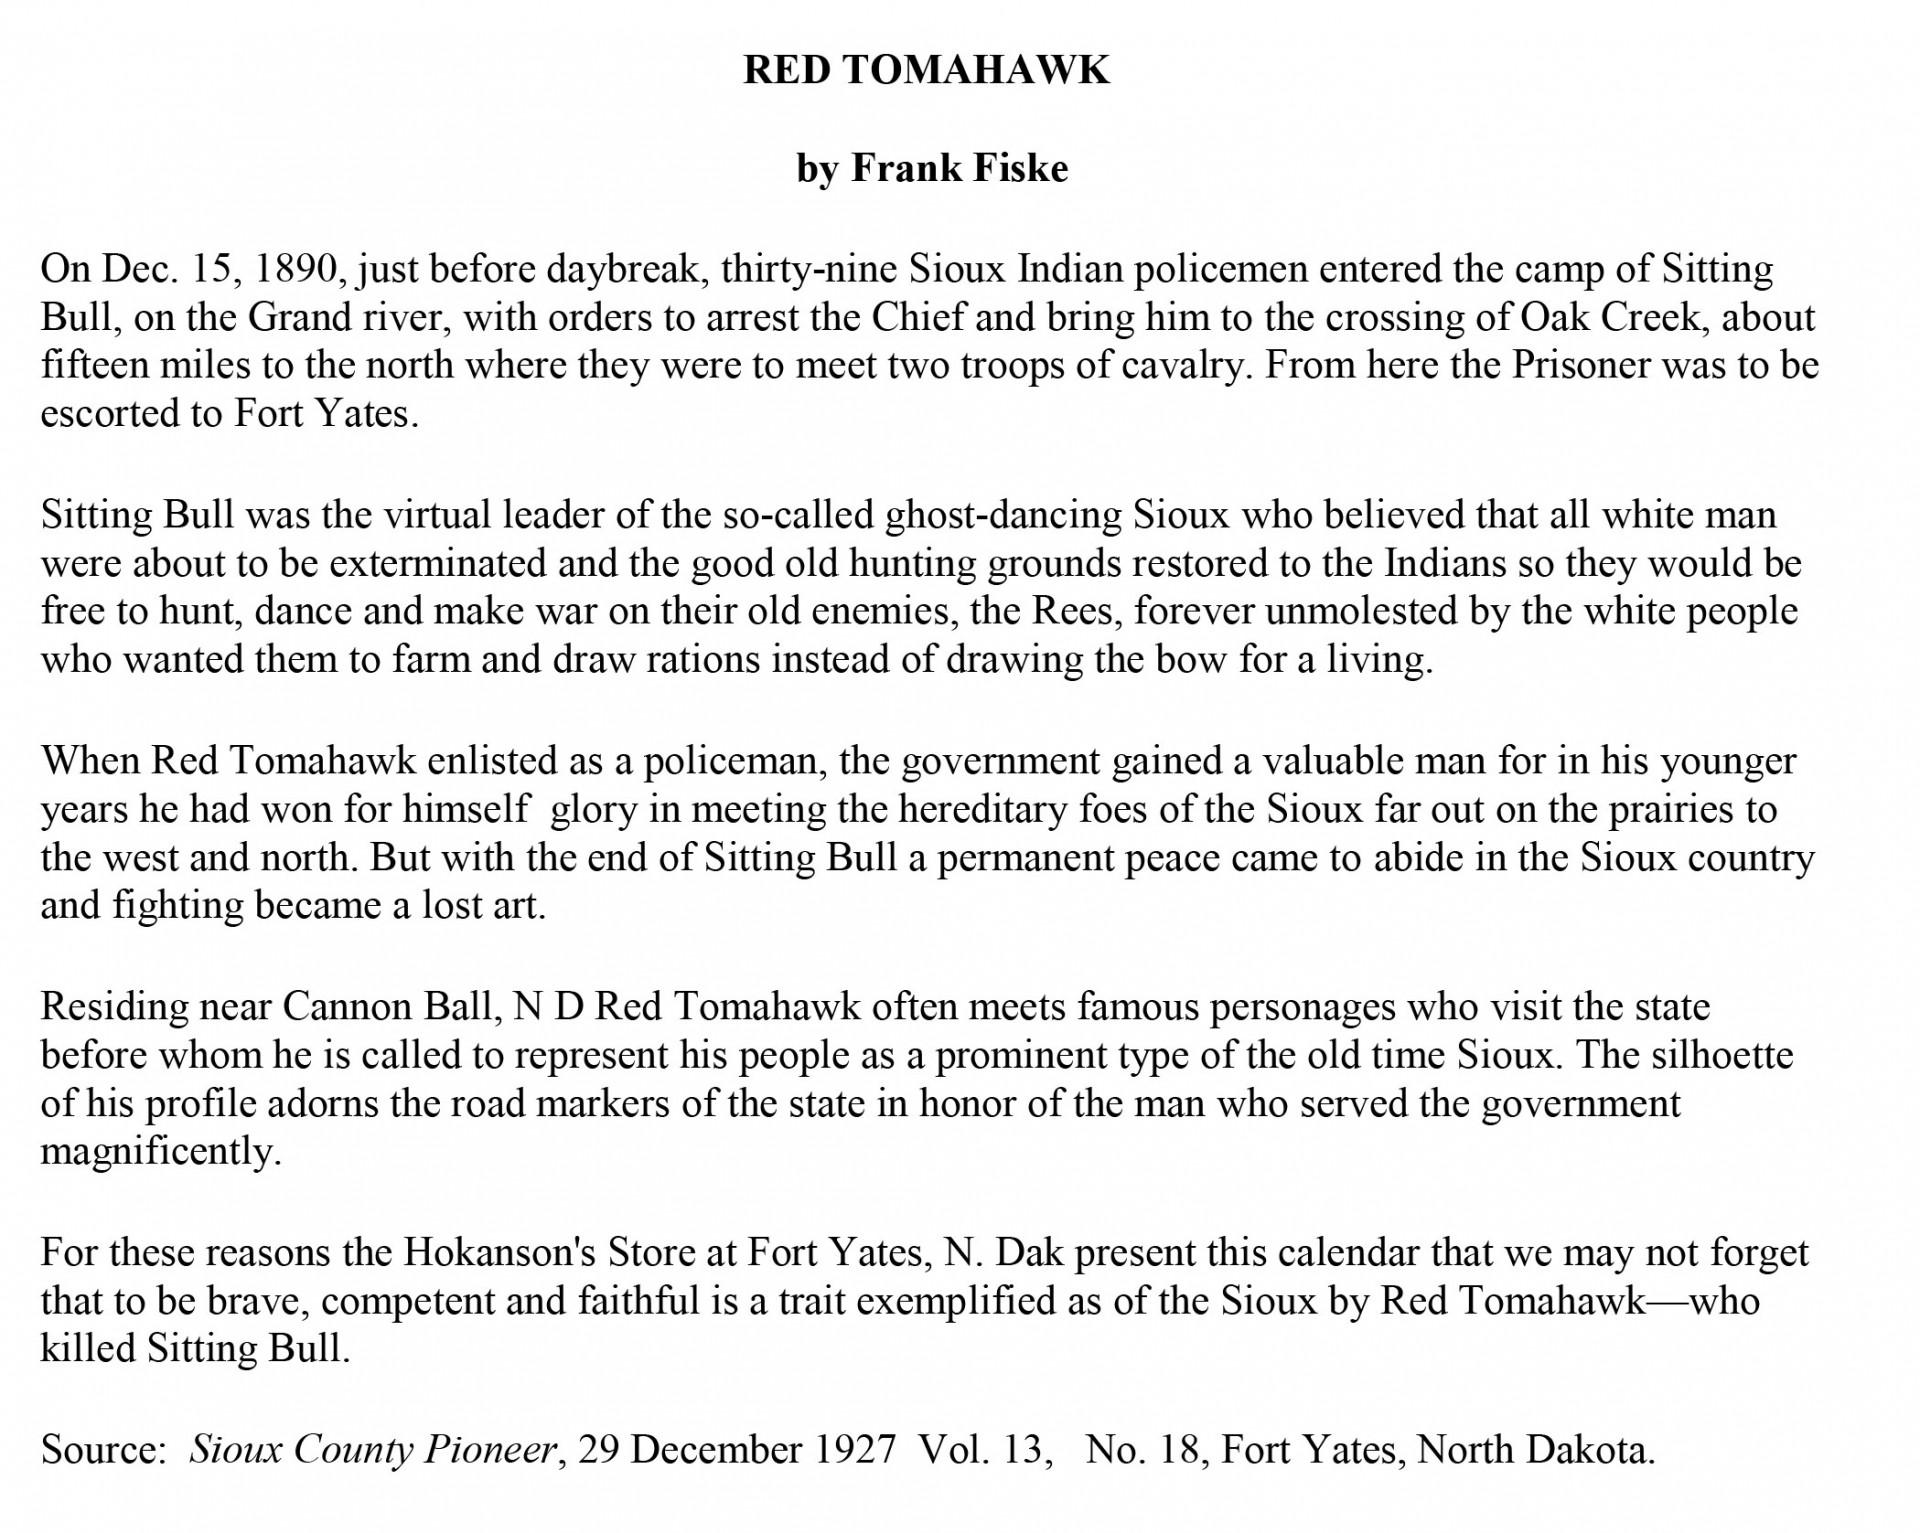 018 Essay Example Fiske Frightening Dance Jazz Topics Scholarships Conclusion 1920